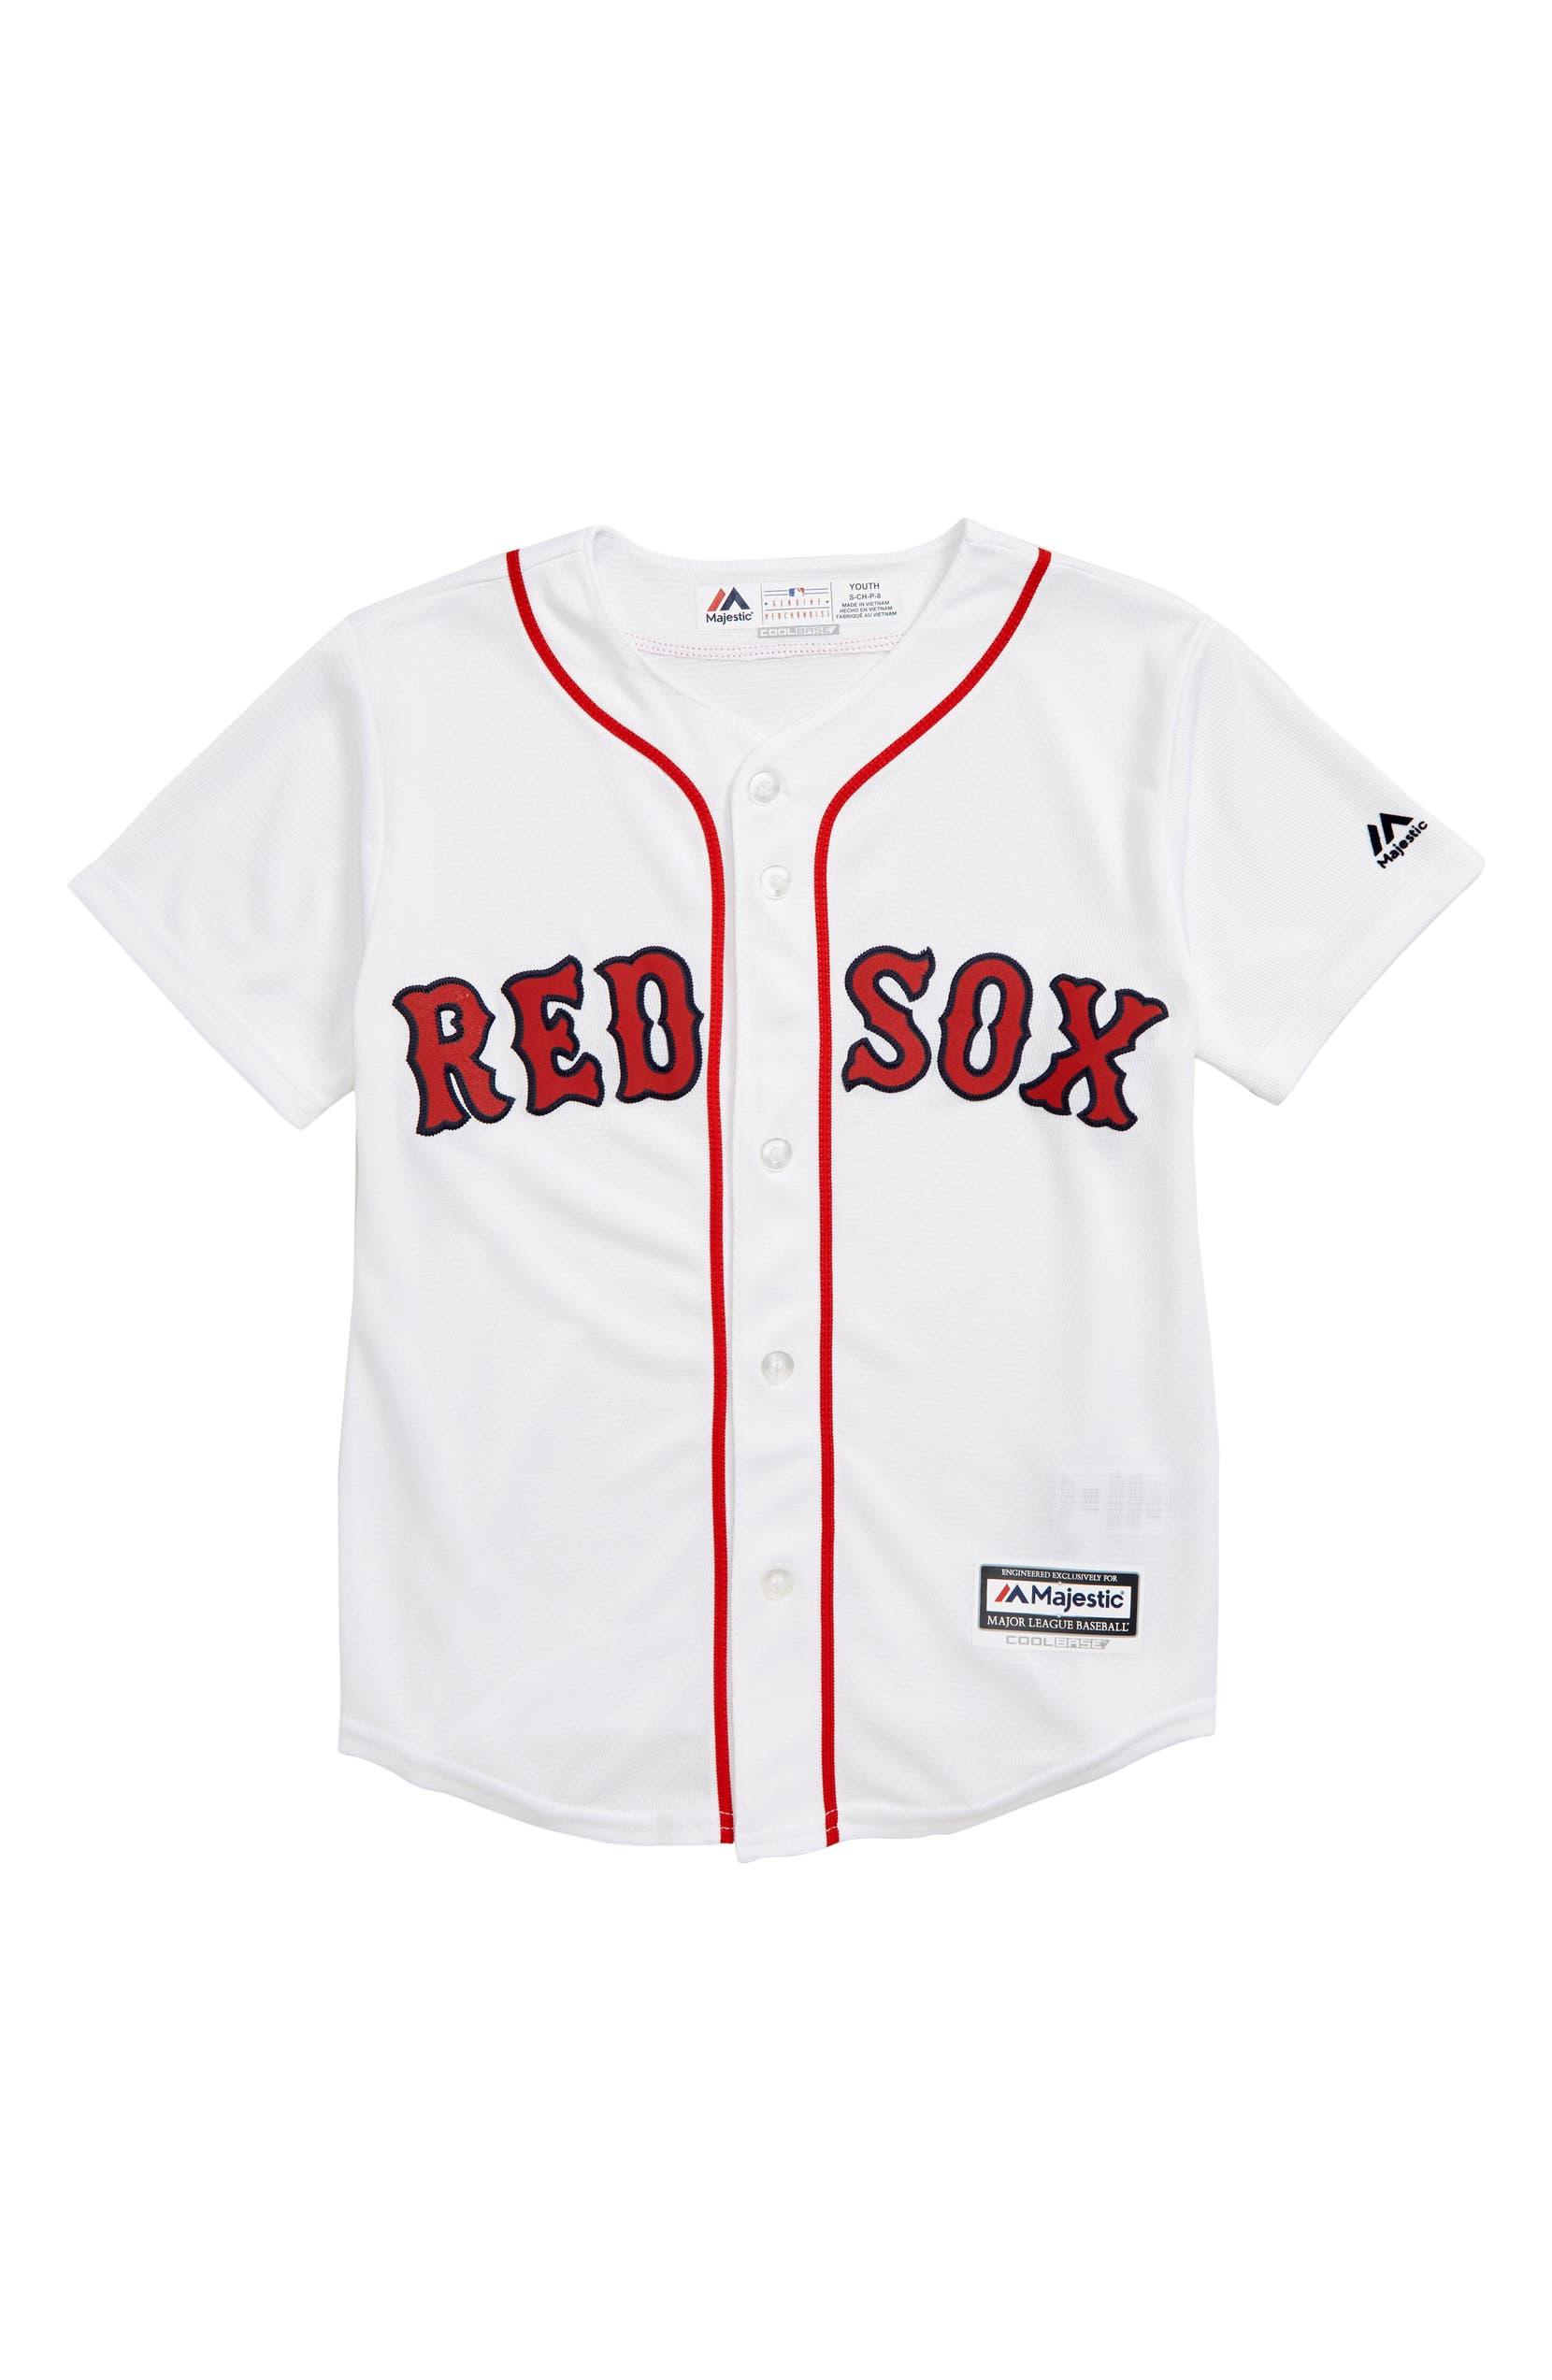 sale retailer 6632b b4360 Majestic MLB Boston Red Sox Replica Baseball Jersey (Big ...